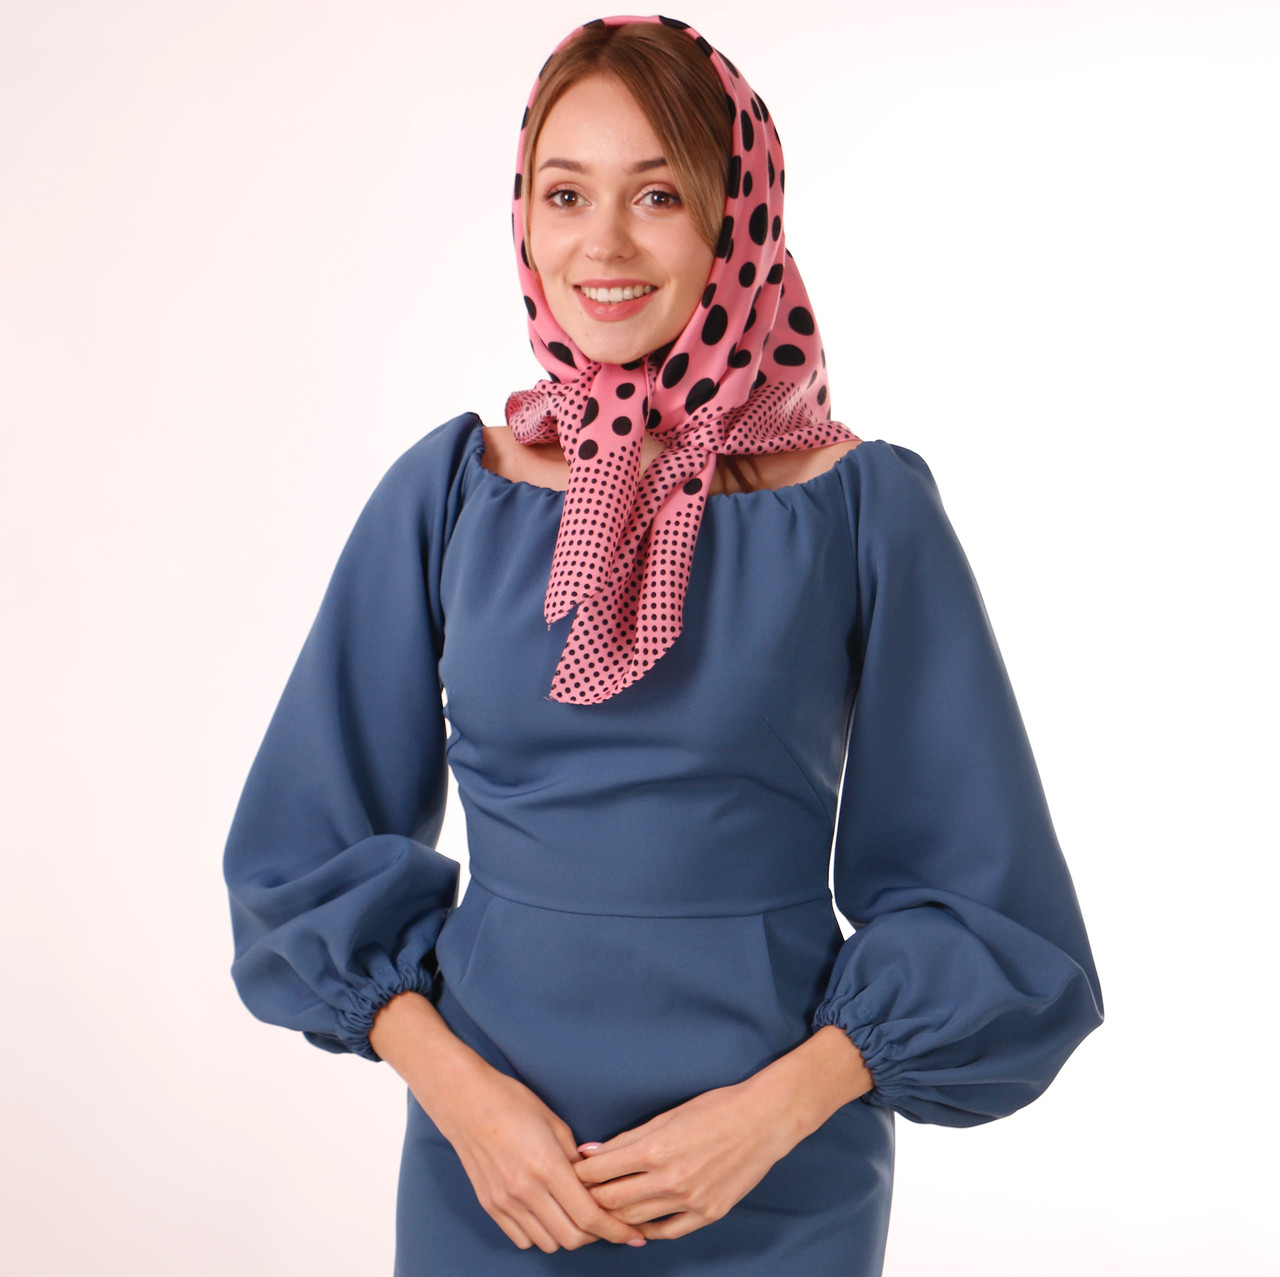 Хустка кашемірова рожева з принтом    75х75 см. К75/68